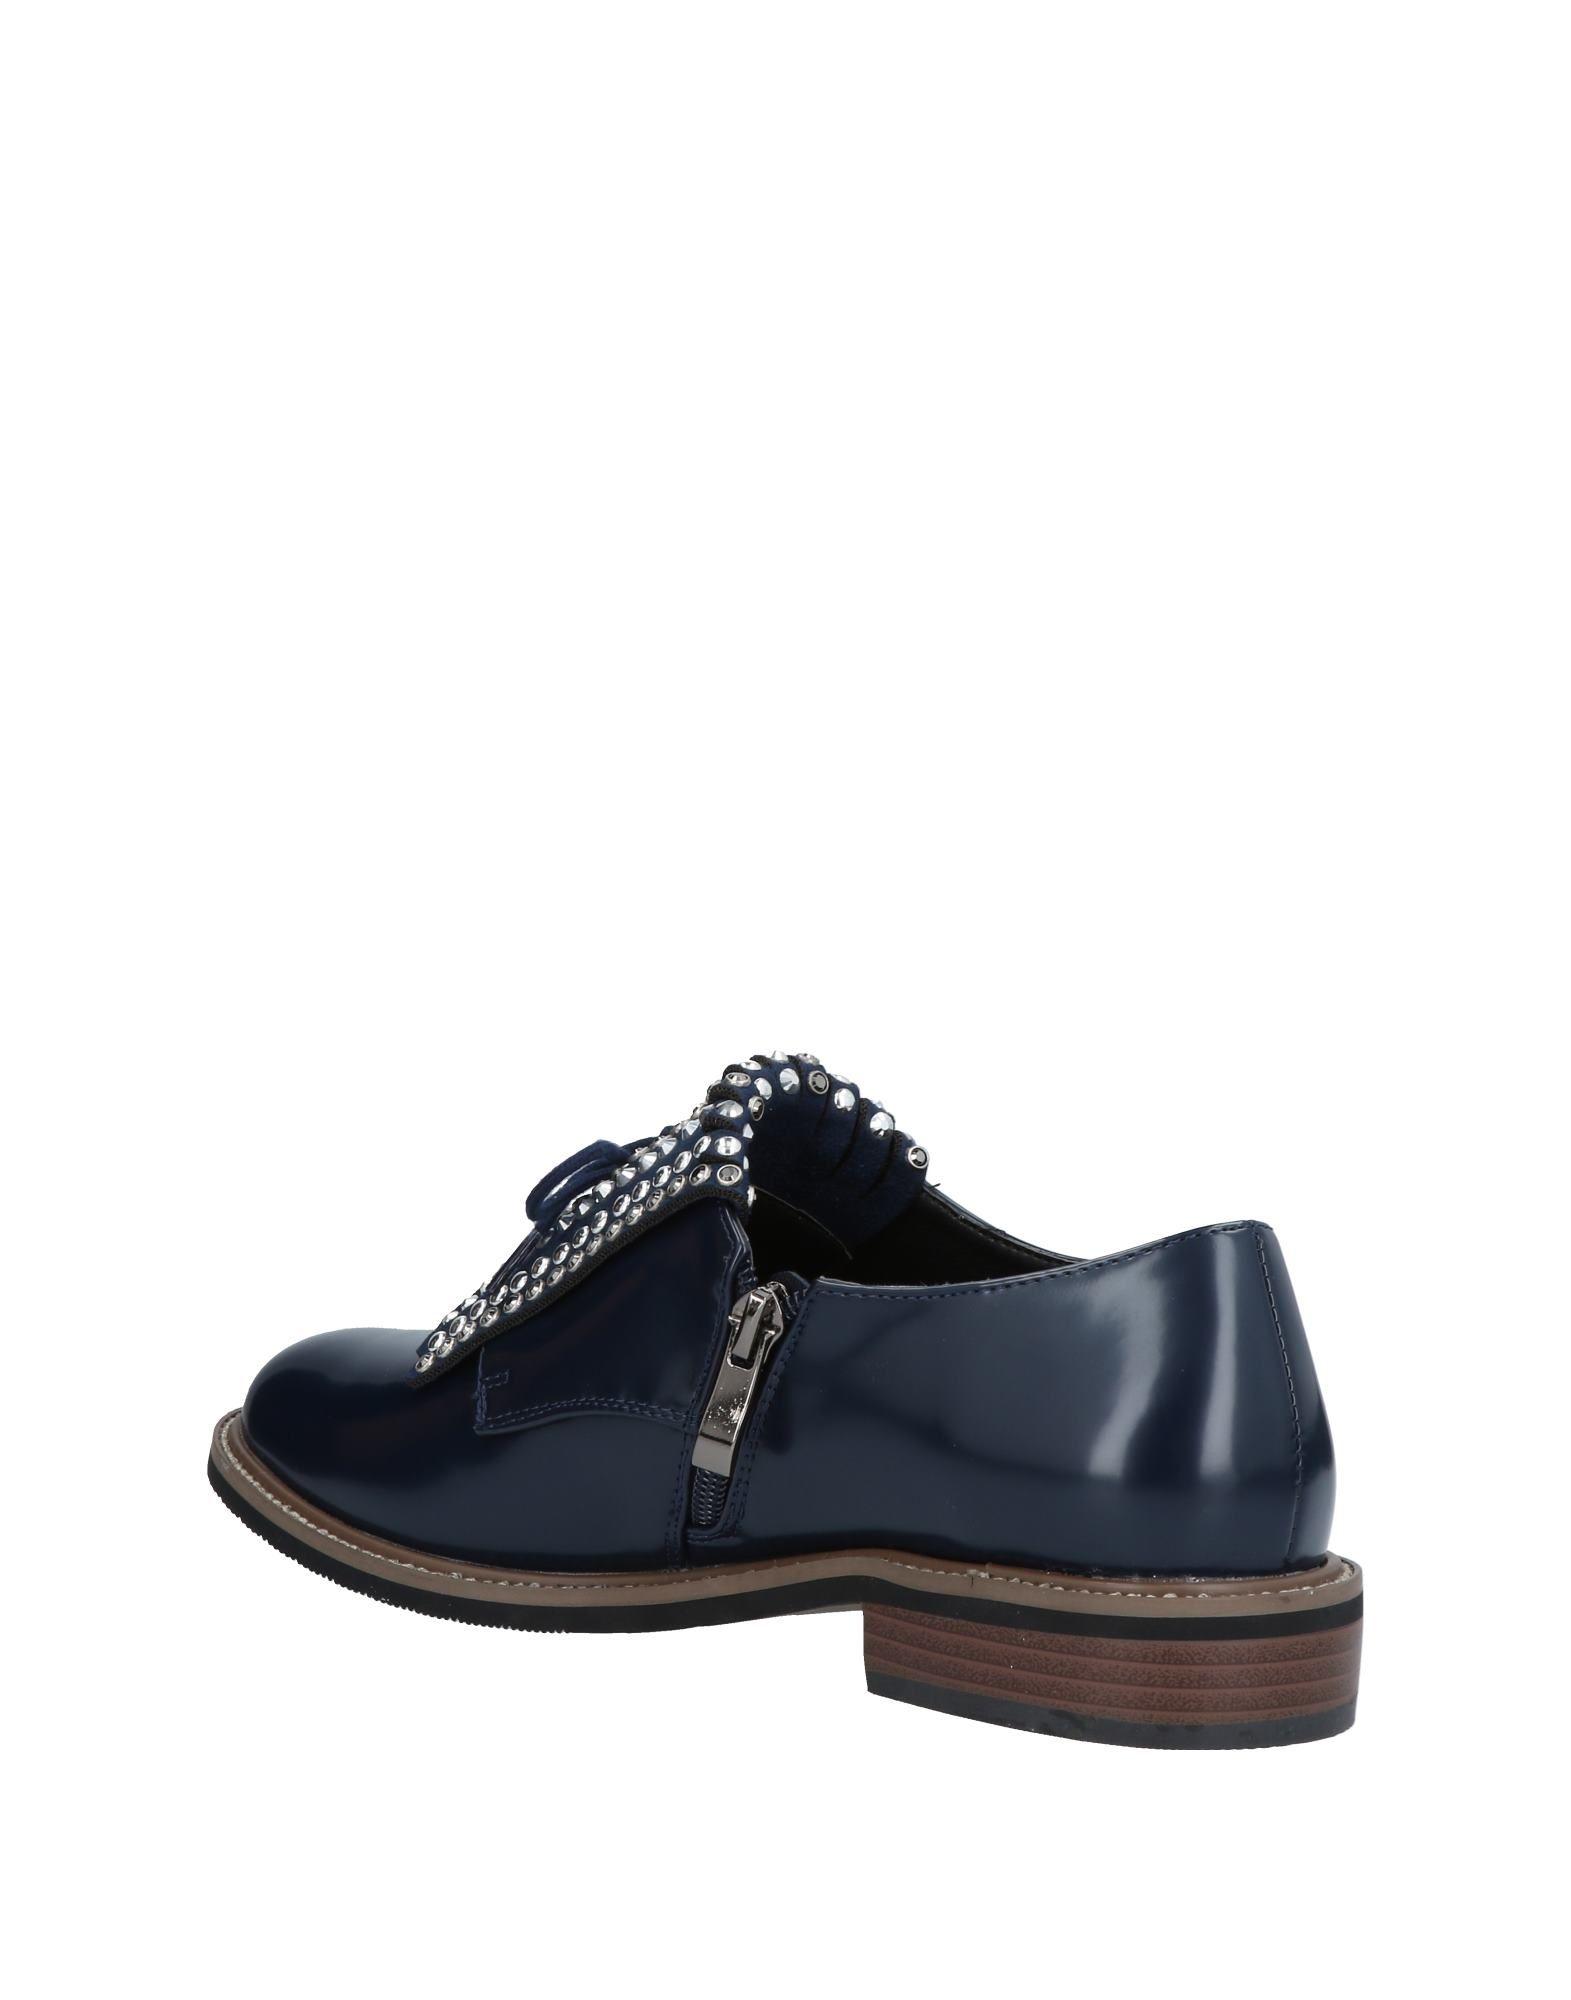 CHAUSSURES - Chaussures à lacetsVivien Lee kSKizKWiyJ